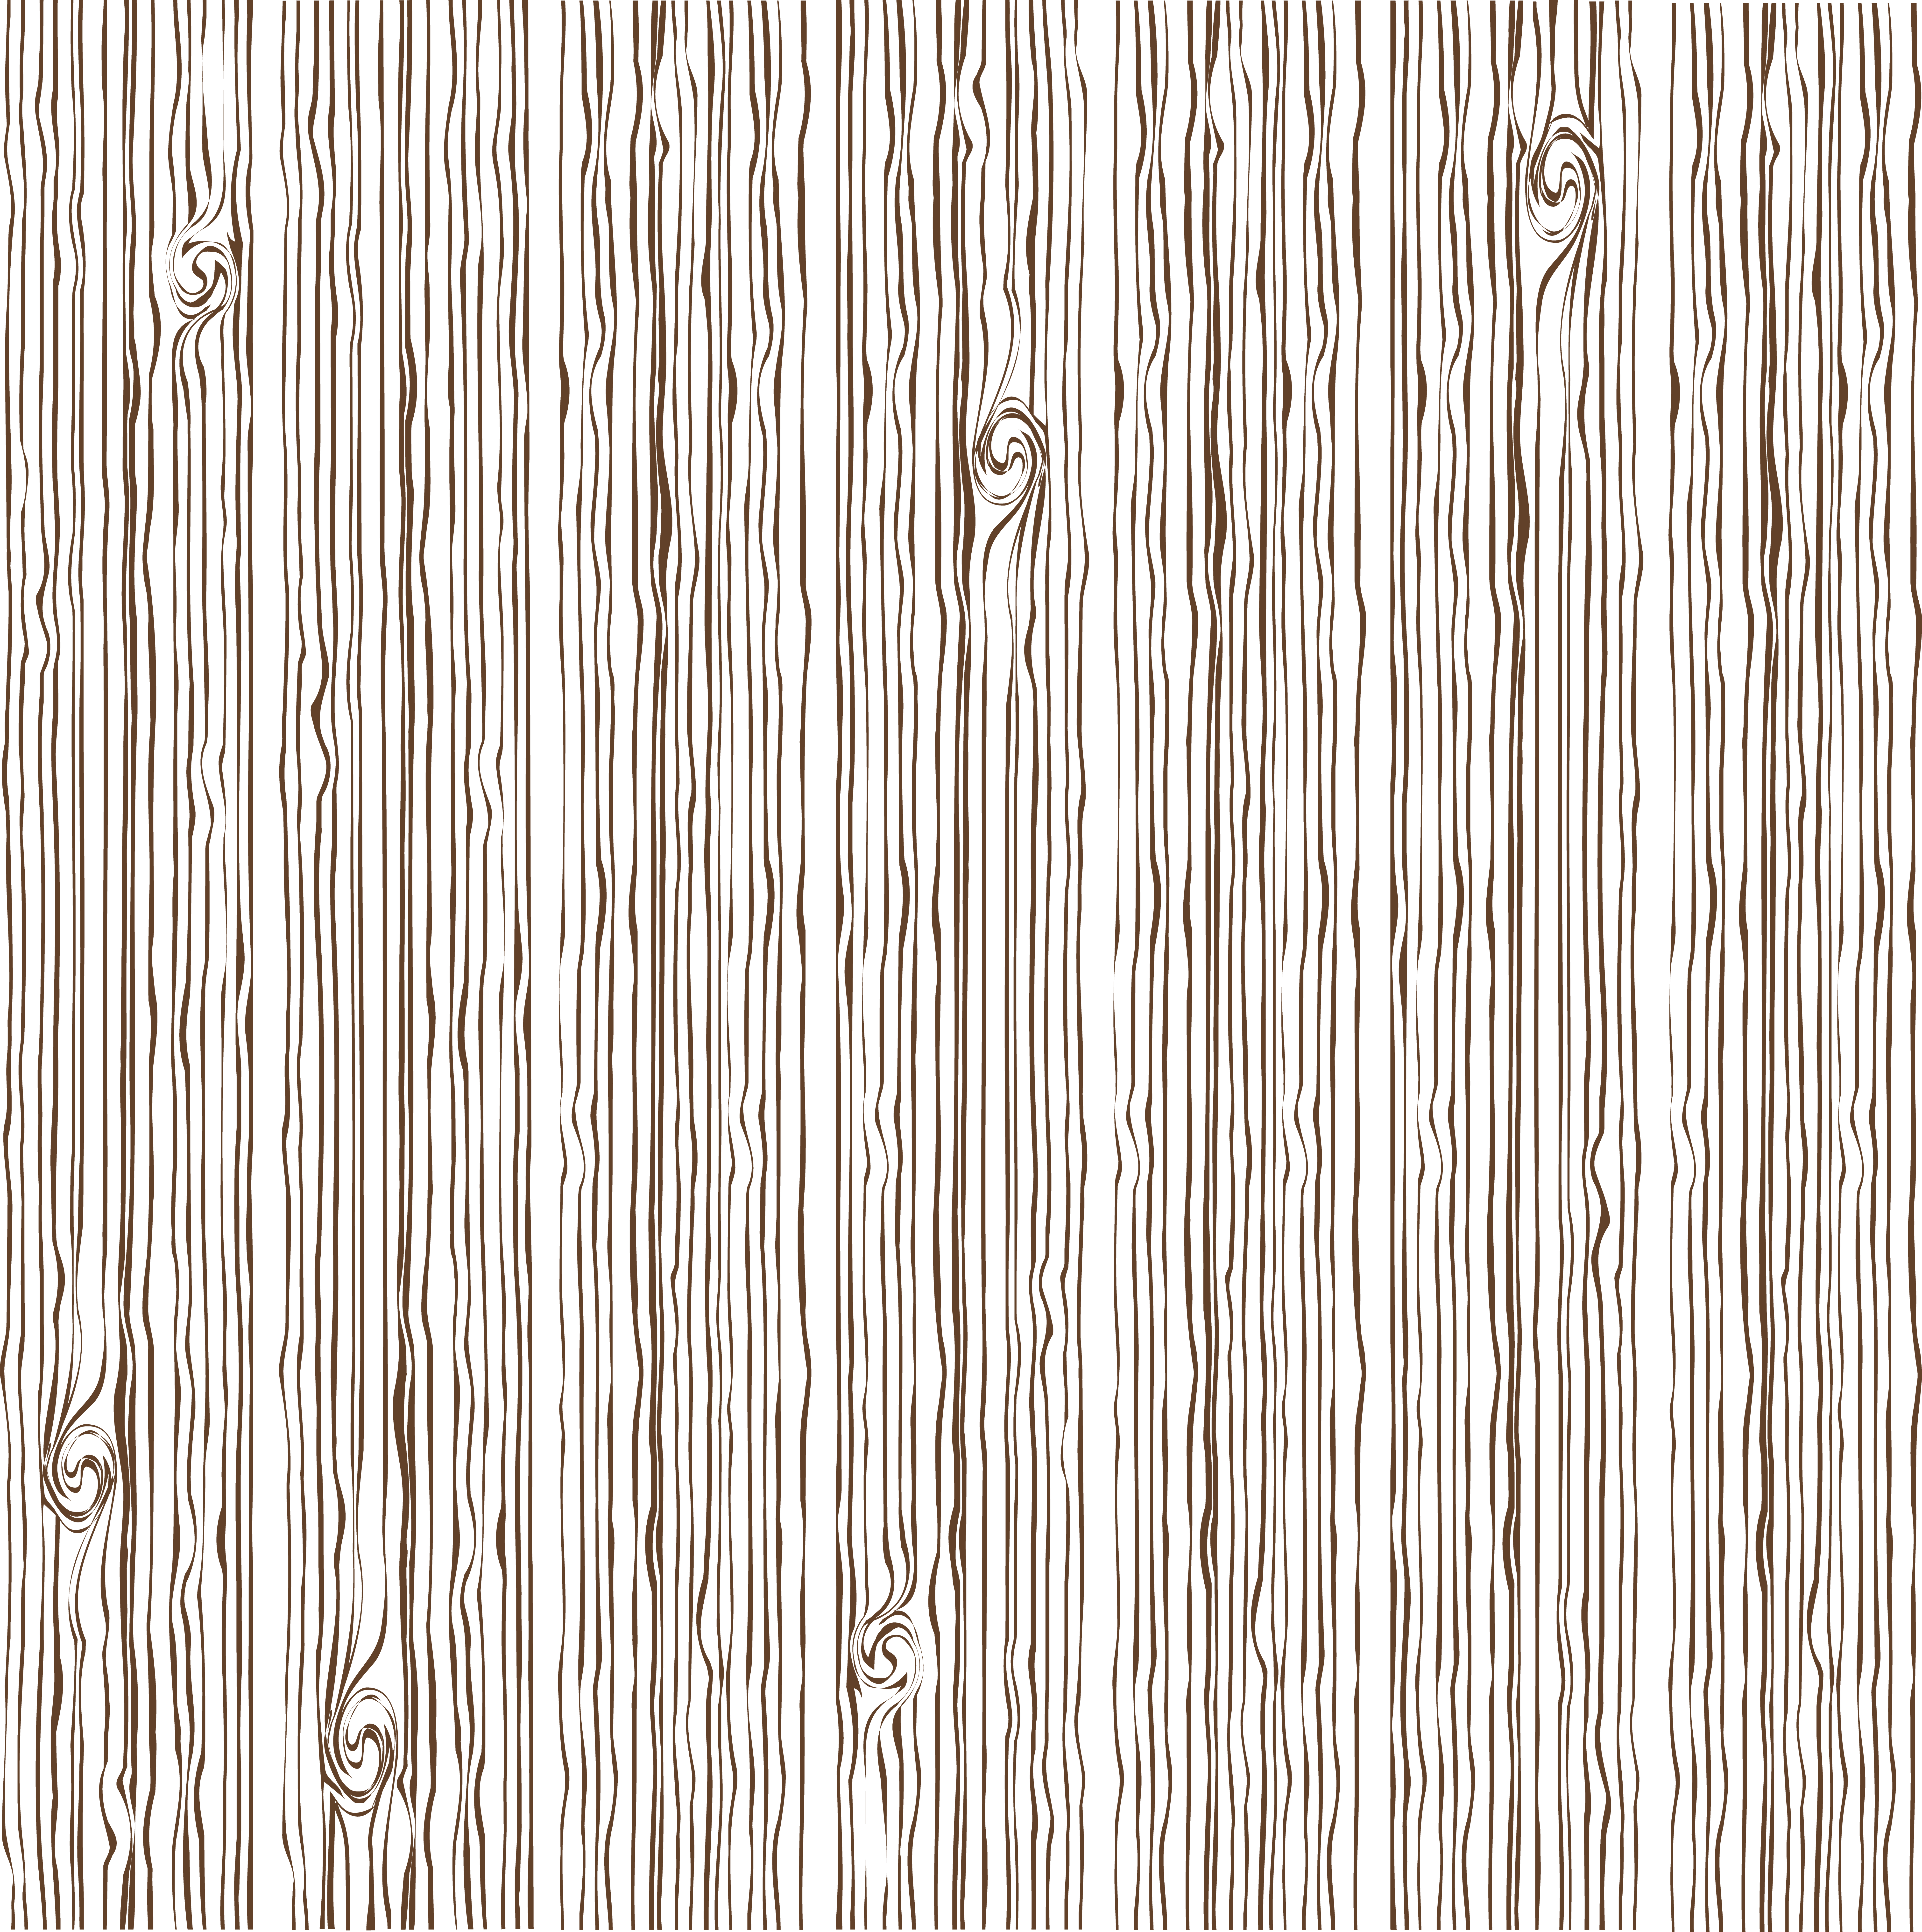 graphic Wooden Effect Transparent PNG Clip Art Image